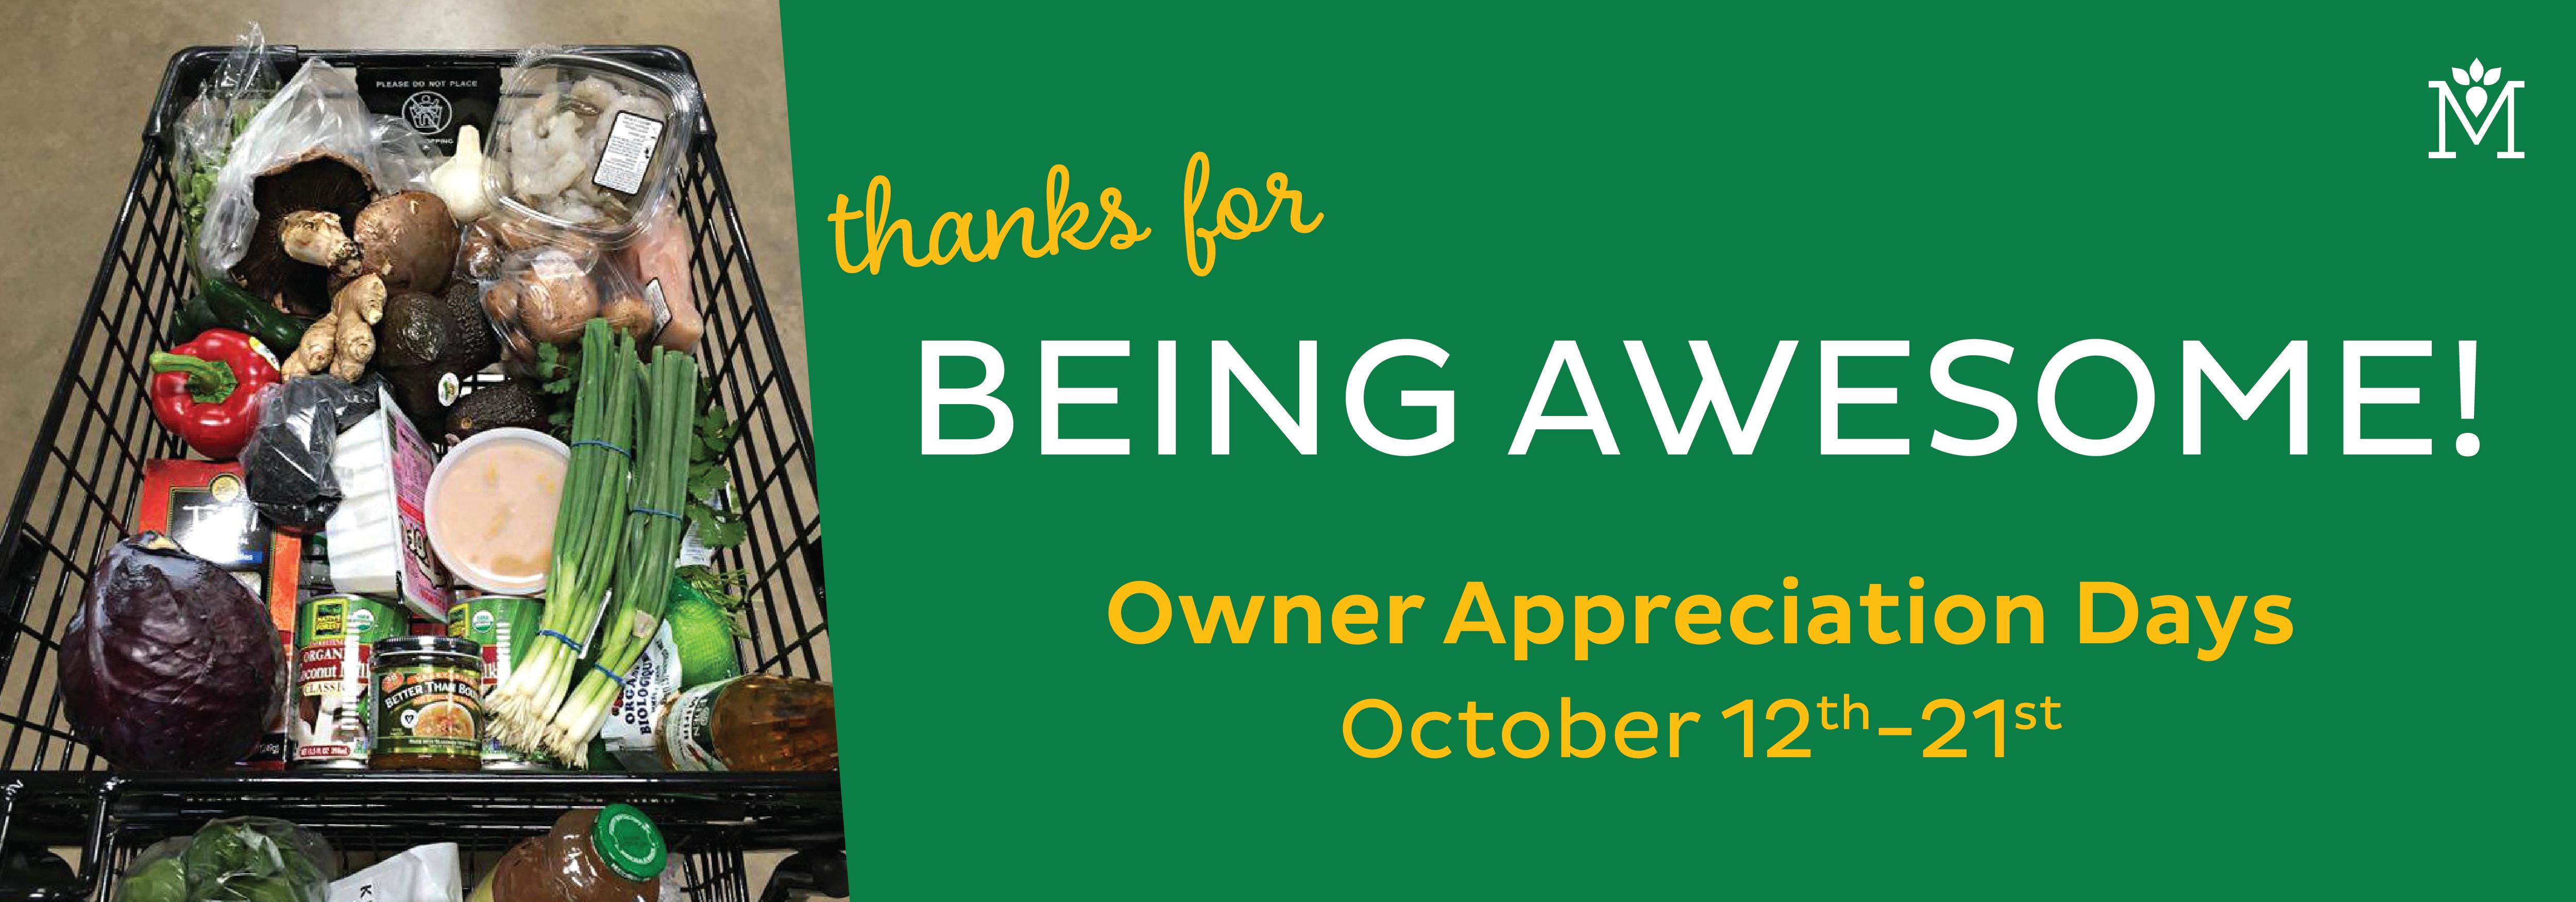 Owner Appreciation Days 2018-01